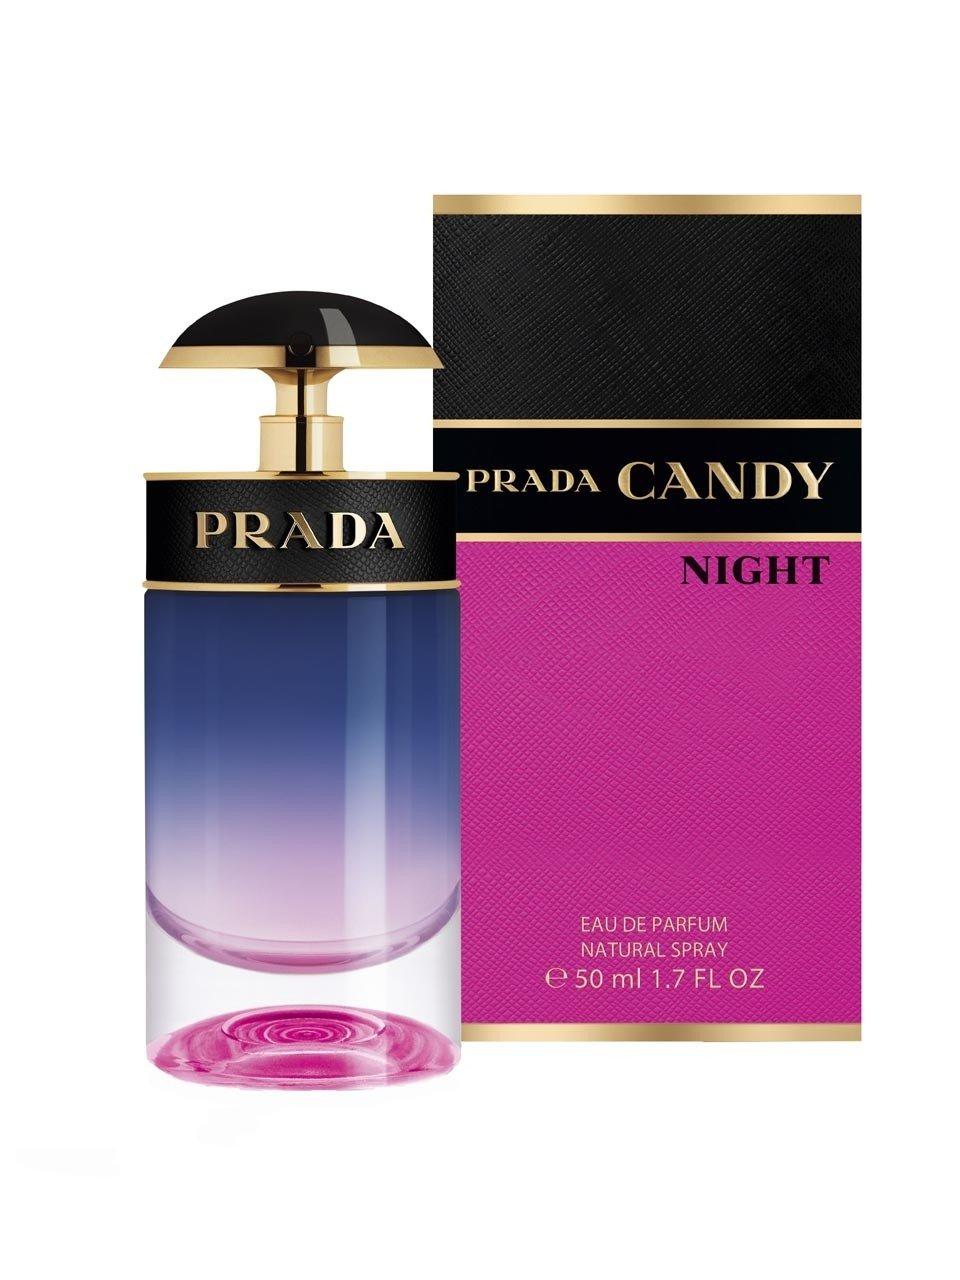 Prada Candy Night Perfume